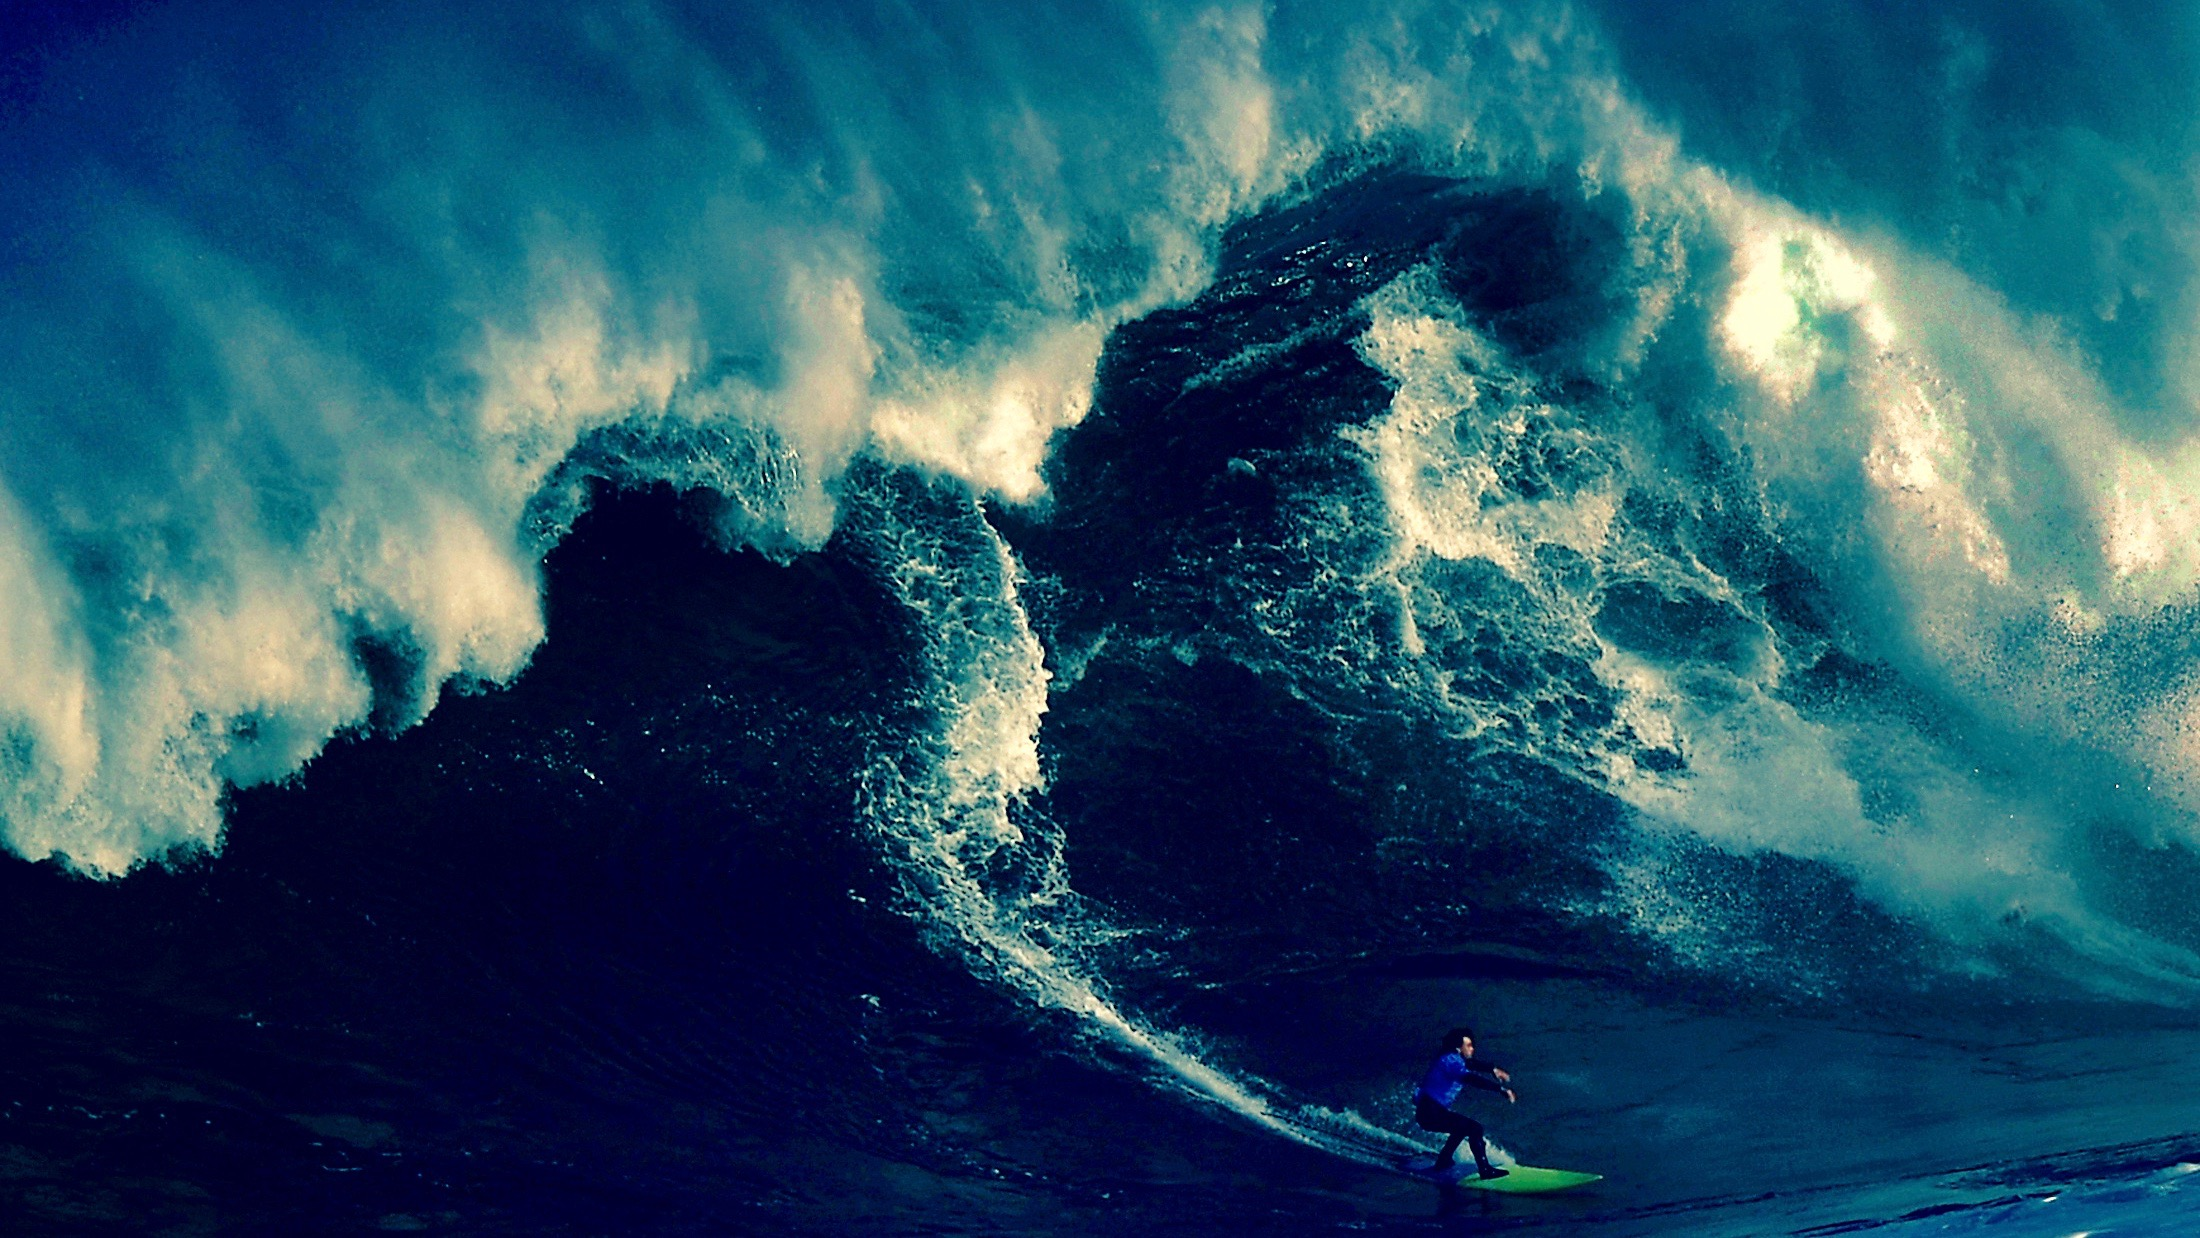 A surfer rides a large wave.